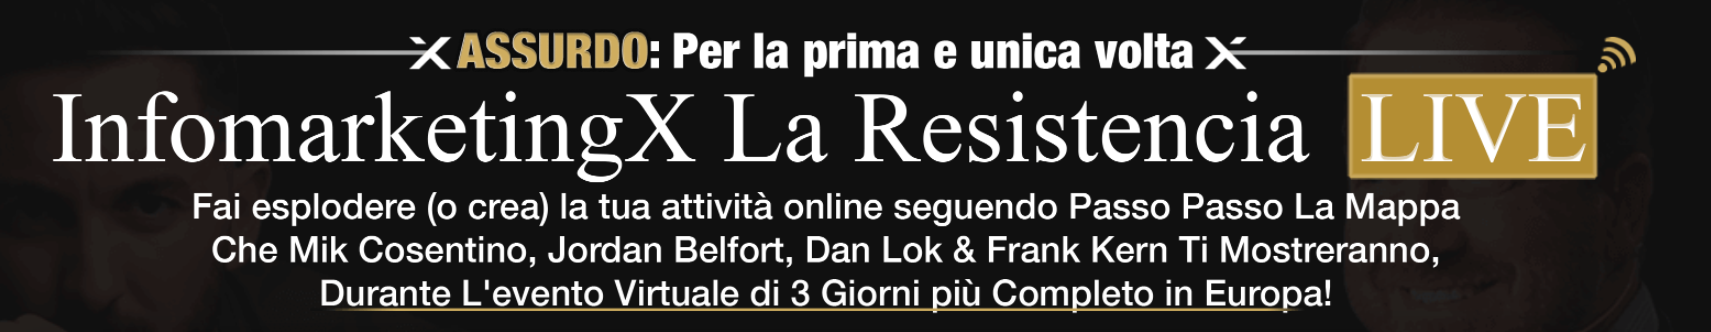 evento resistencia live